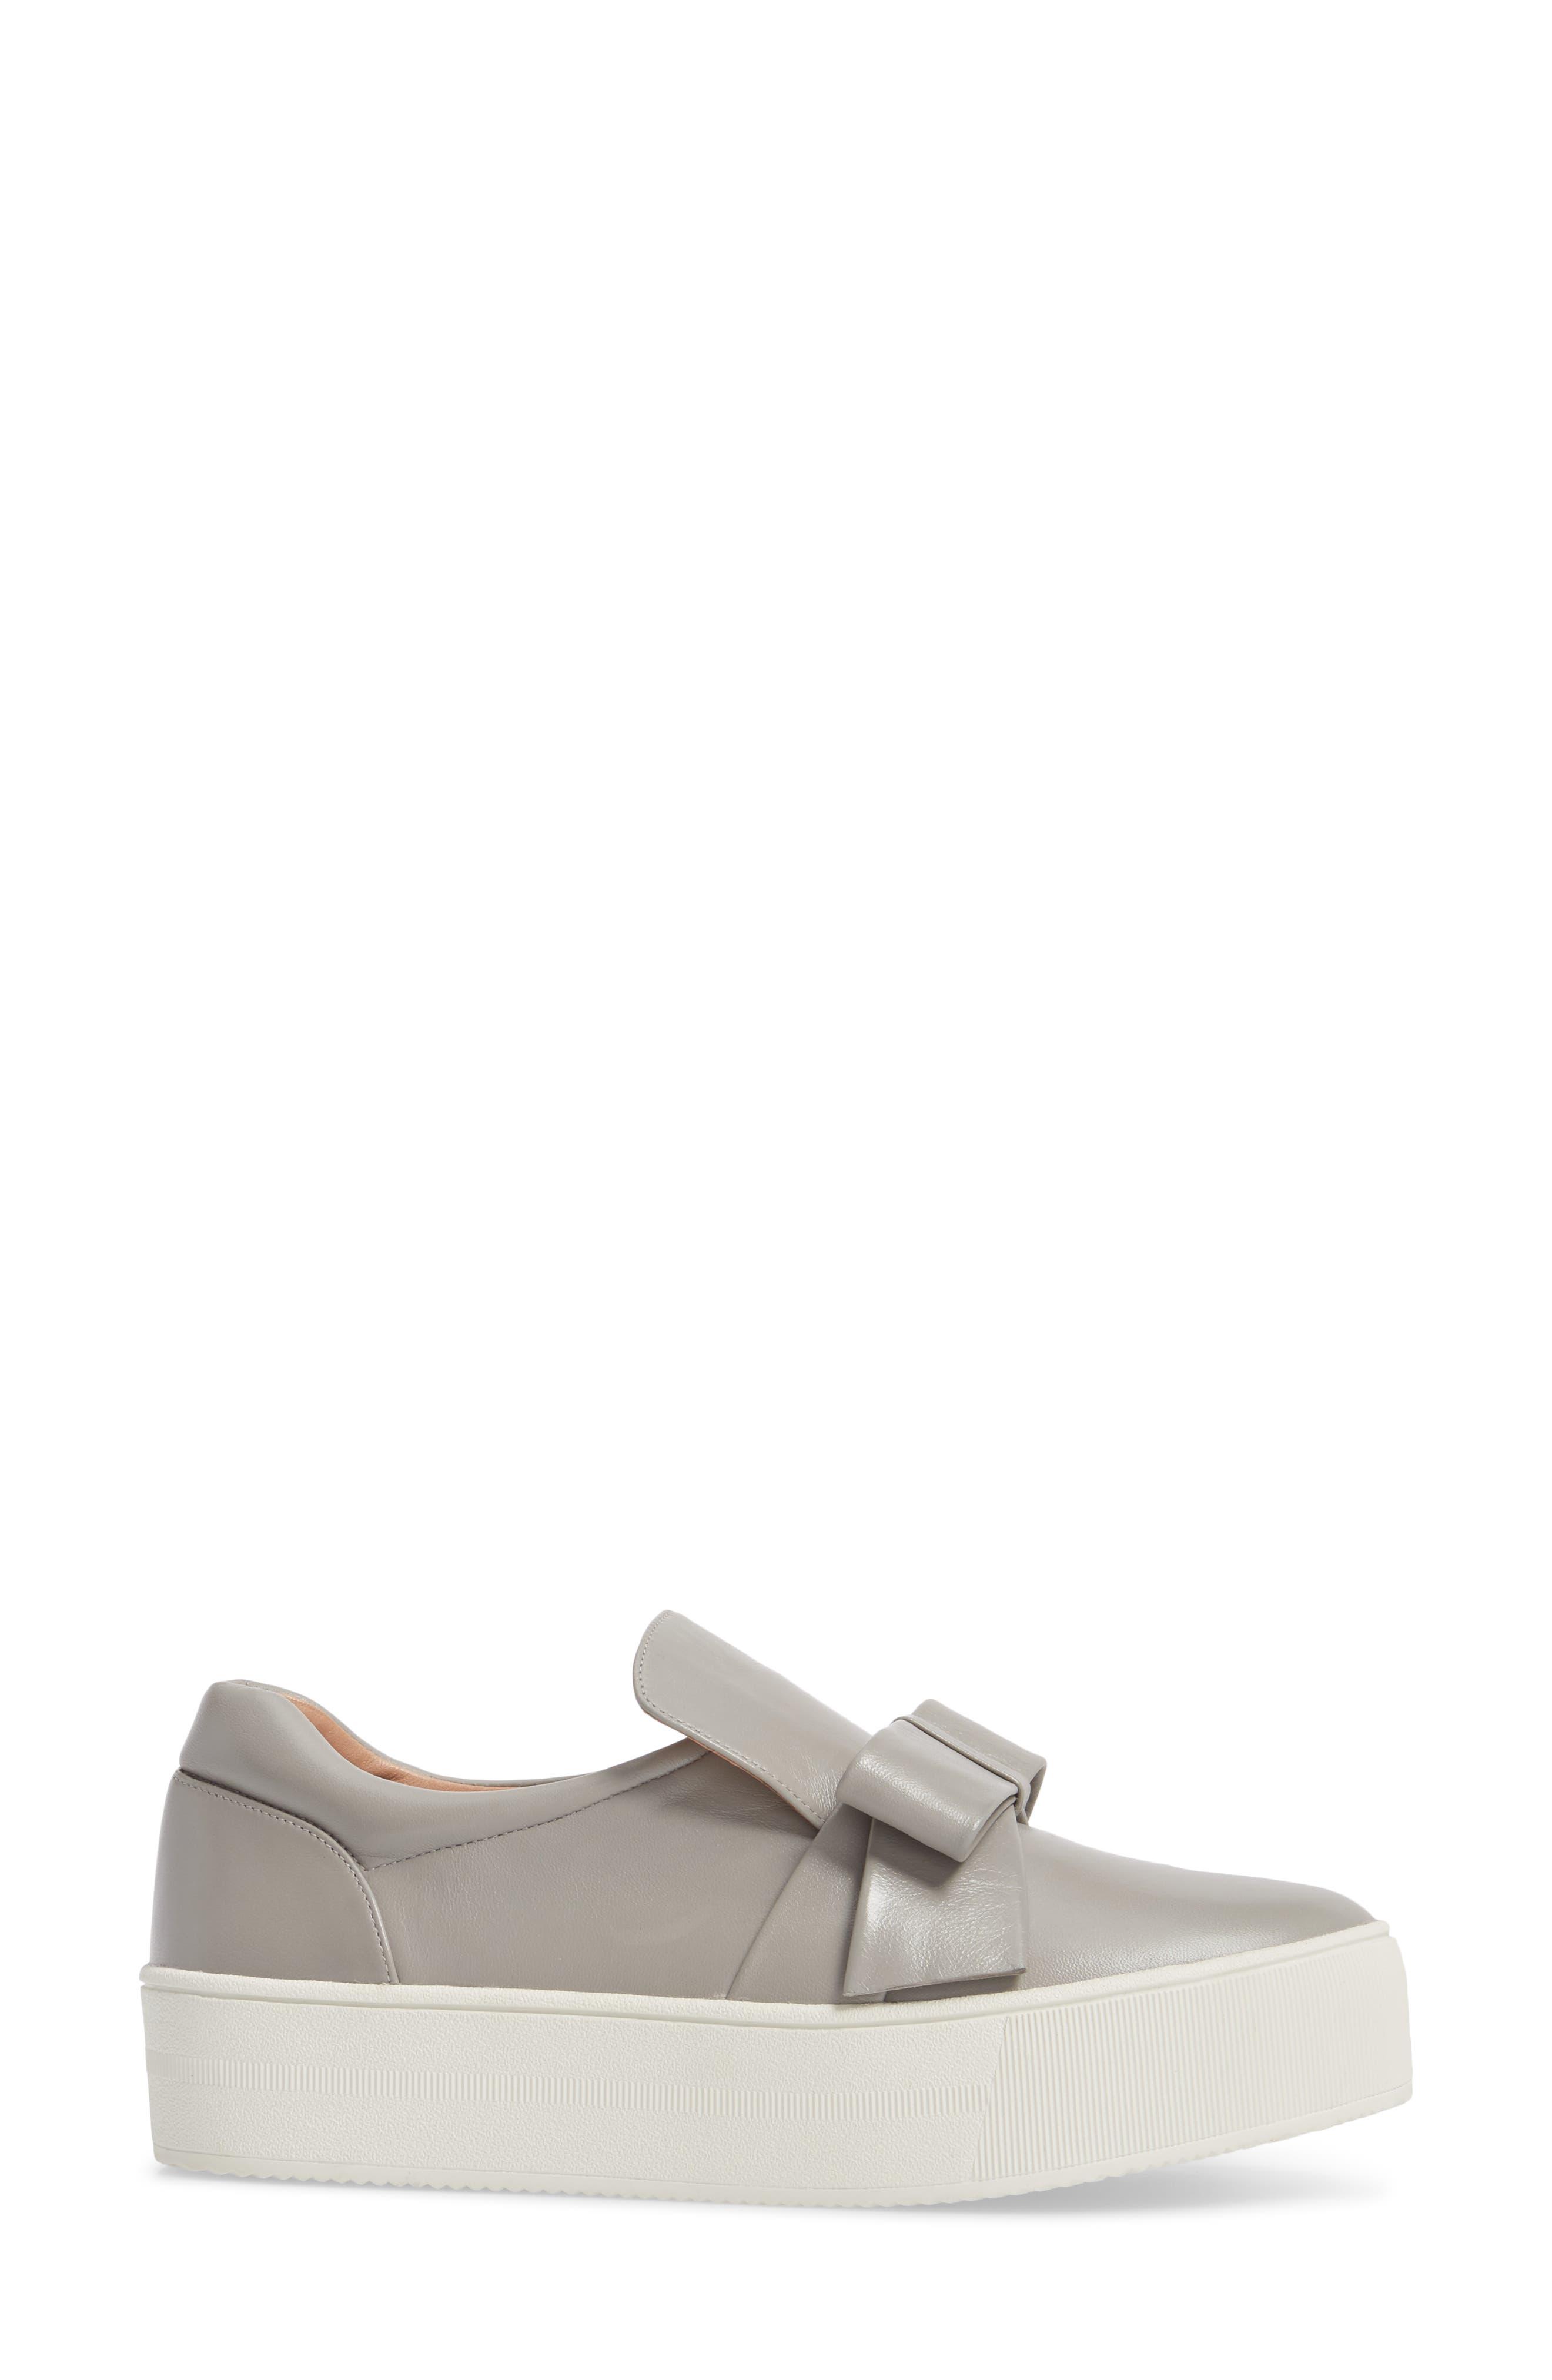 Vania Bow Platform Sneaker,                             Alternate thumbnail 6, color,